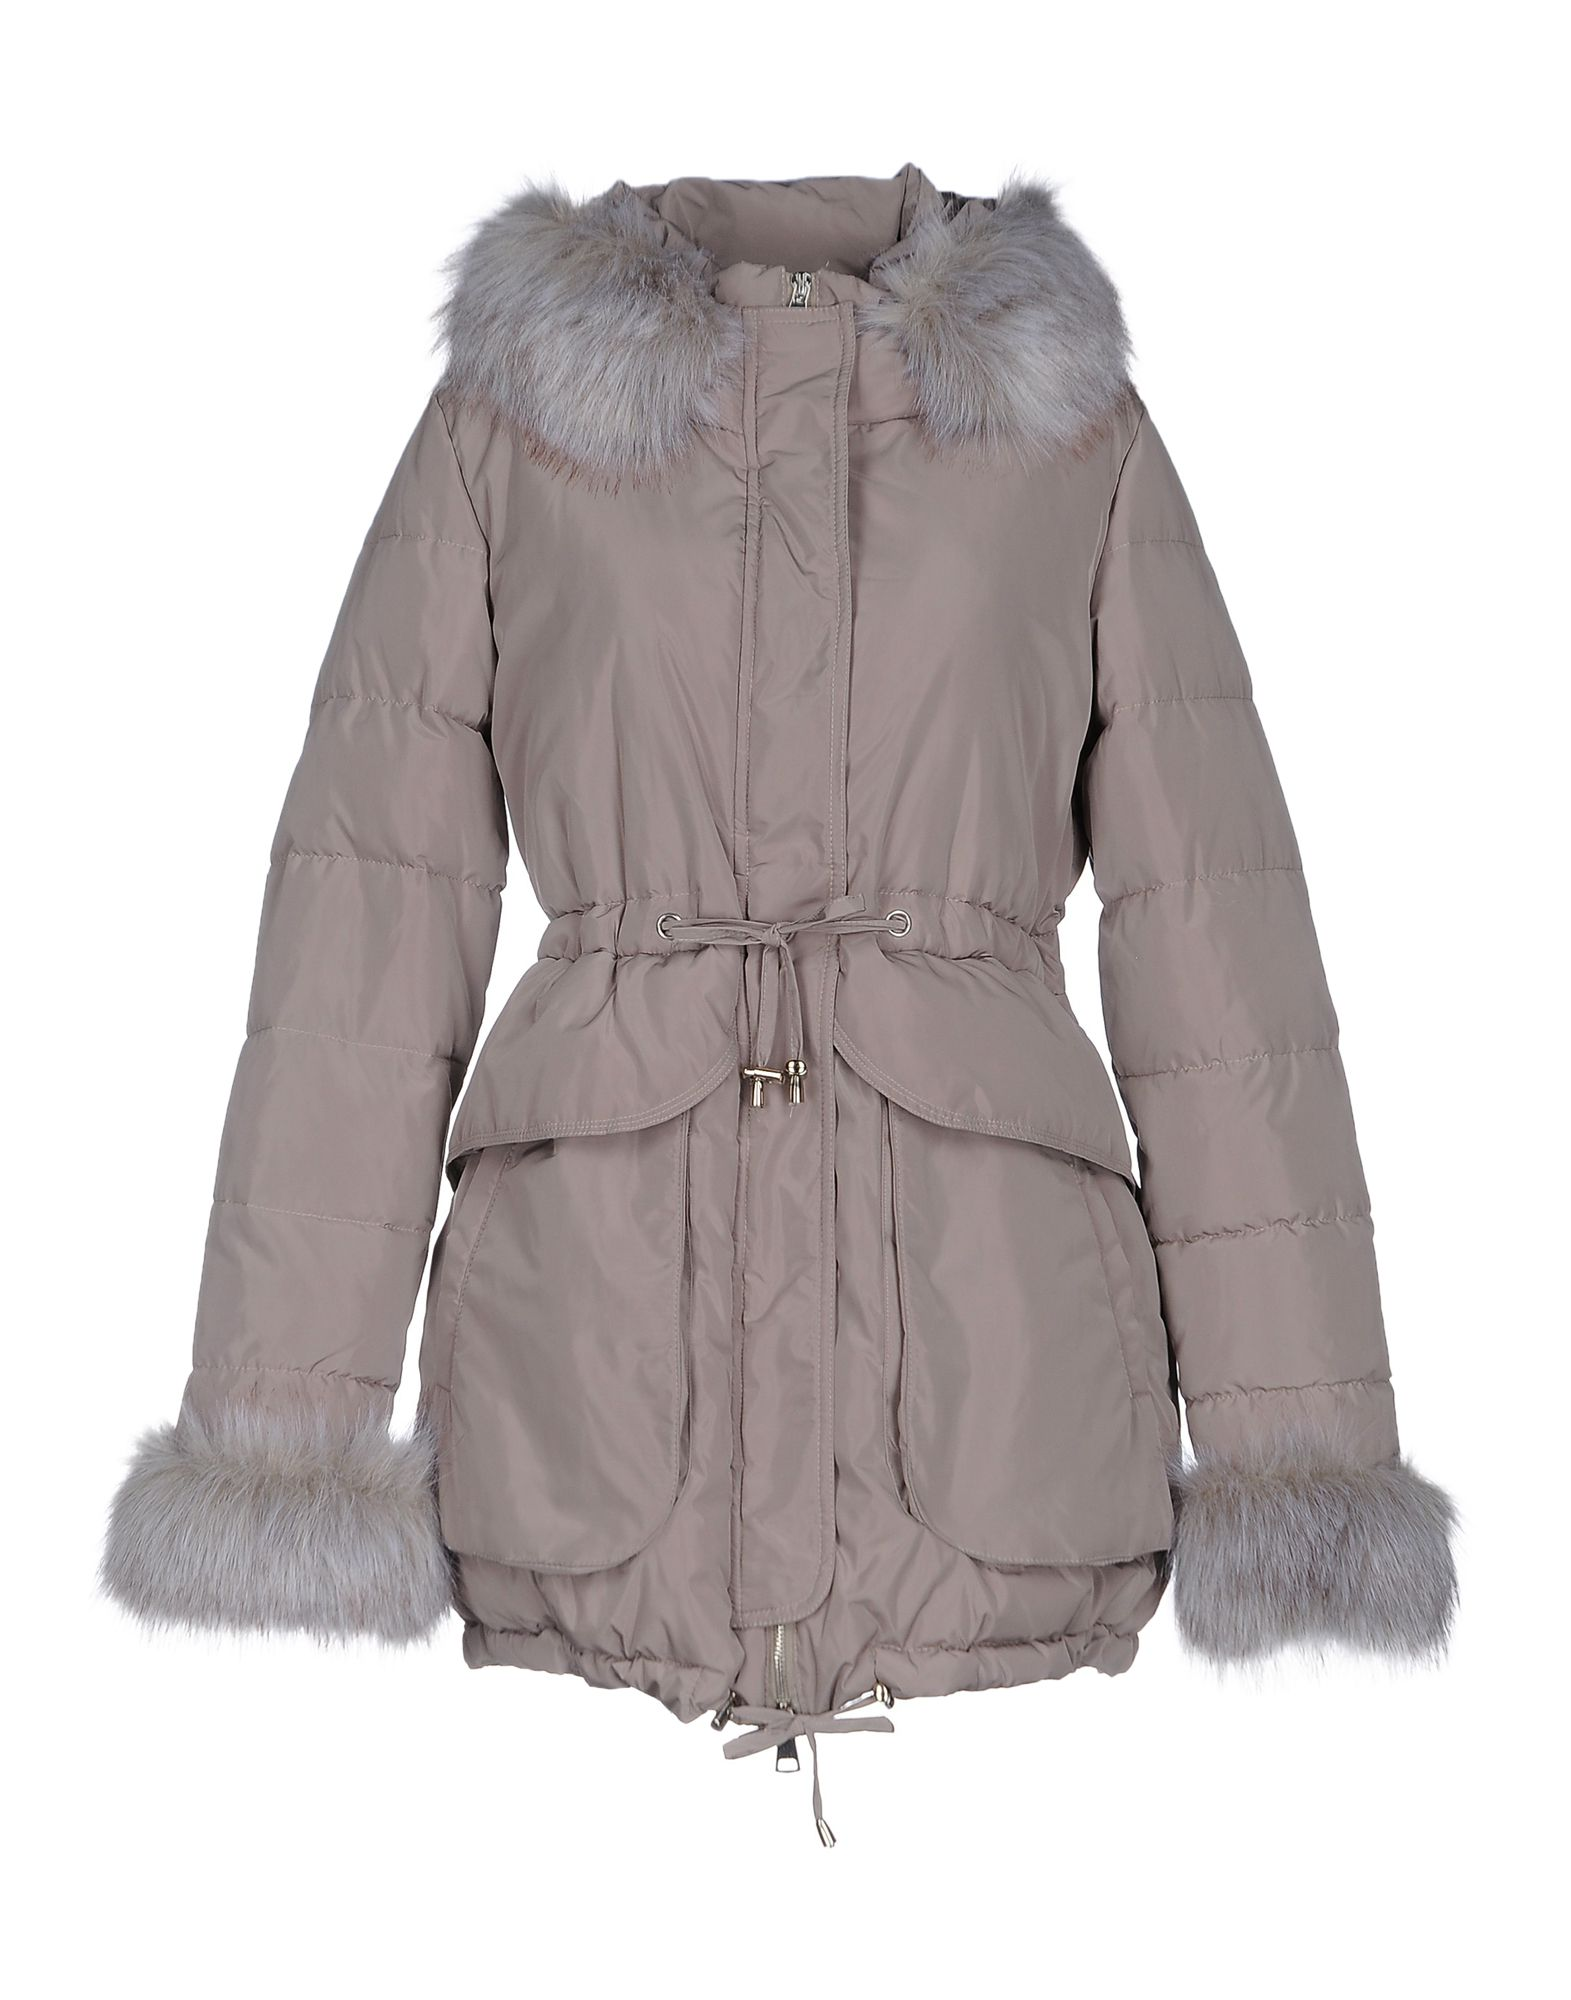 ANDREA MORANDO Damen Jacke Farbe Hellgrau Größe 5 - broschei